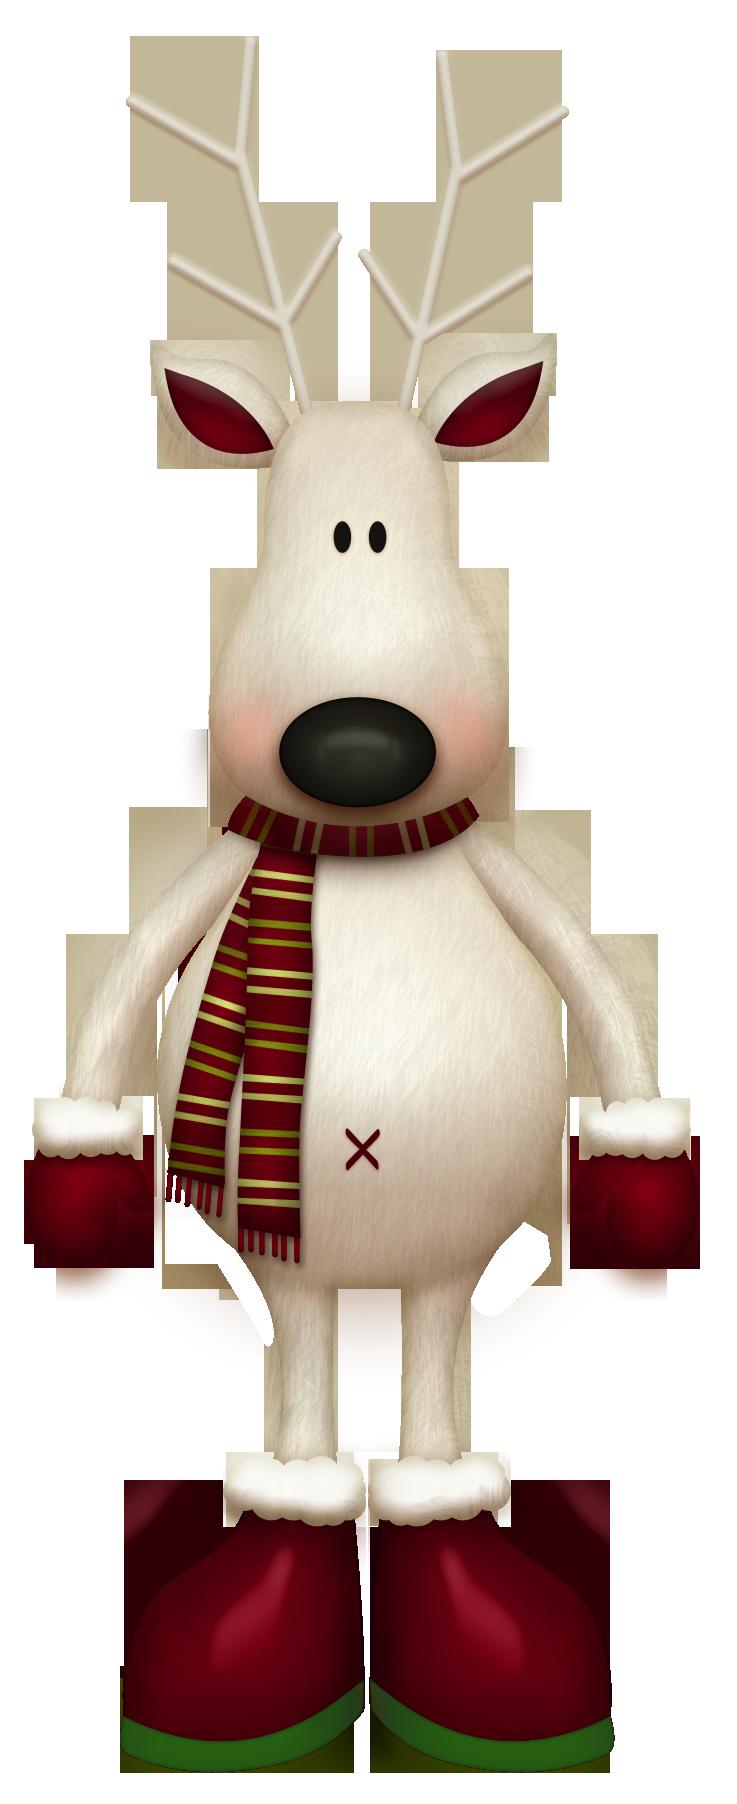 Clipart reindeer whimsical, Clipart reindeer whimsical.